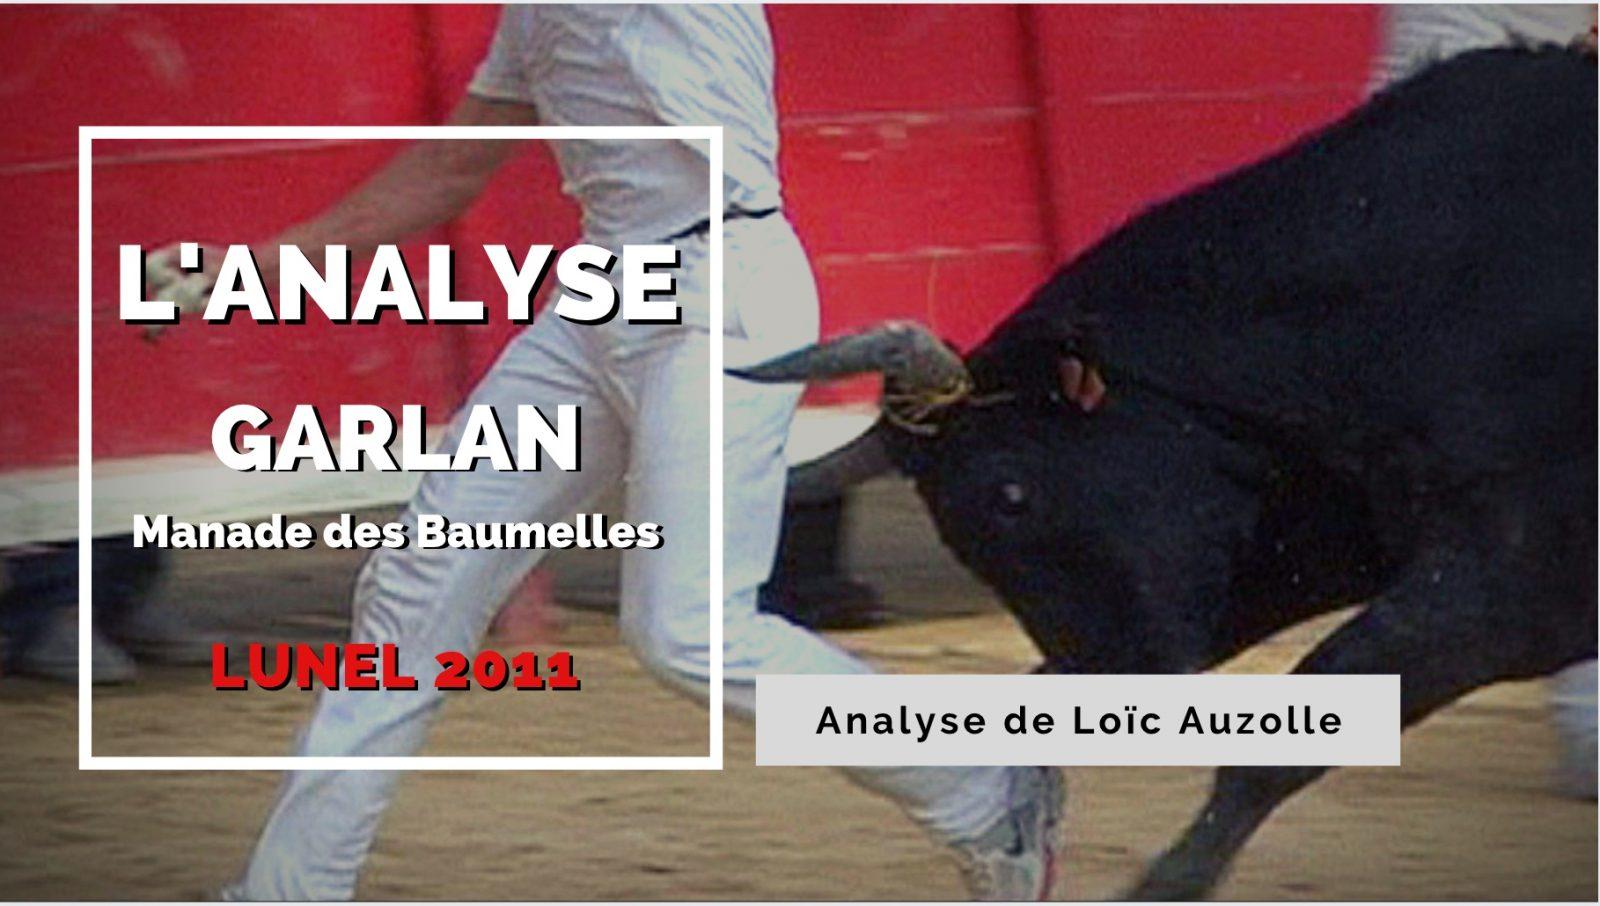 VIDEO // L'ANALYSE – Garlan (Manade des Baumelles) – LUNEL 2011 – AU FIL DES BARRIERES